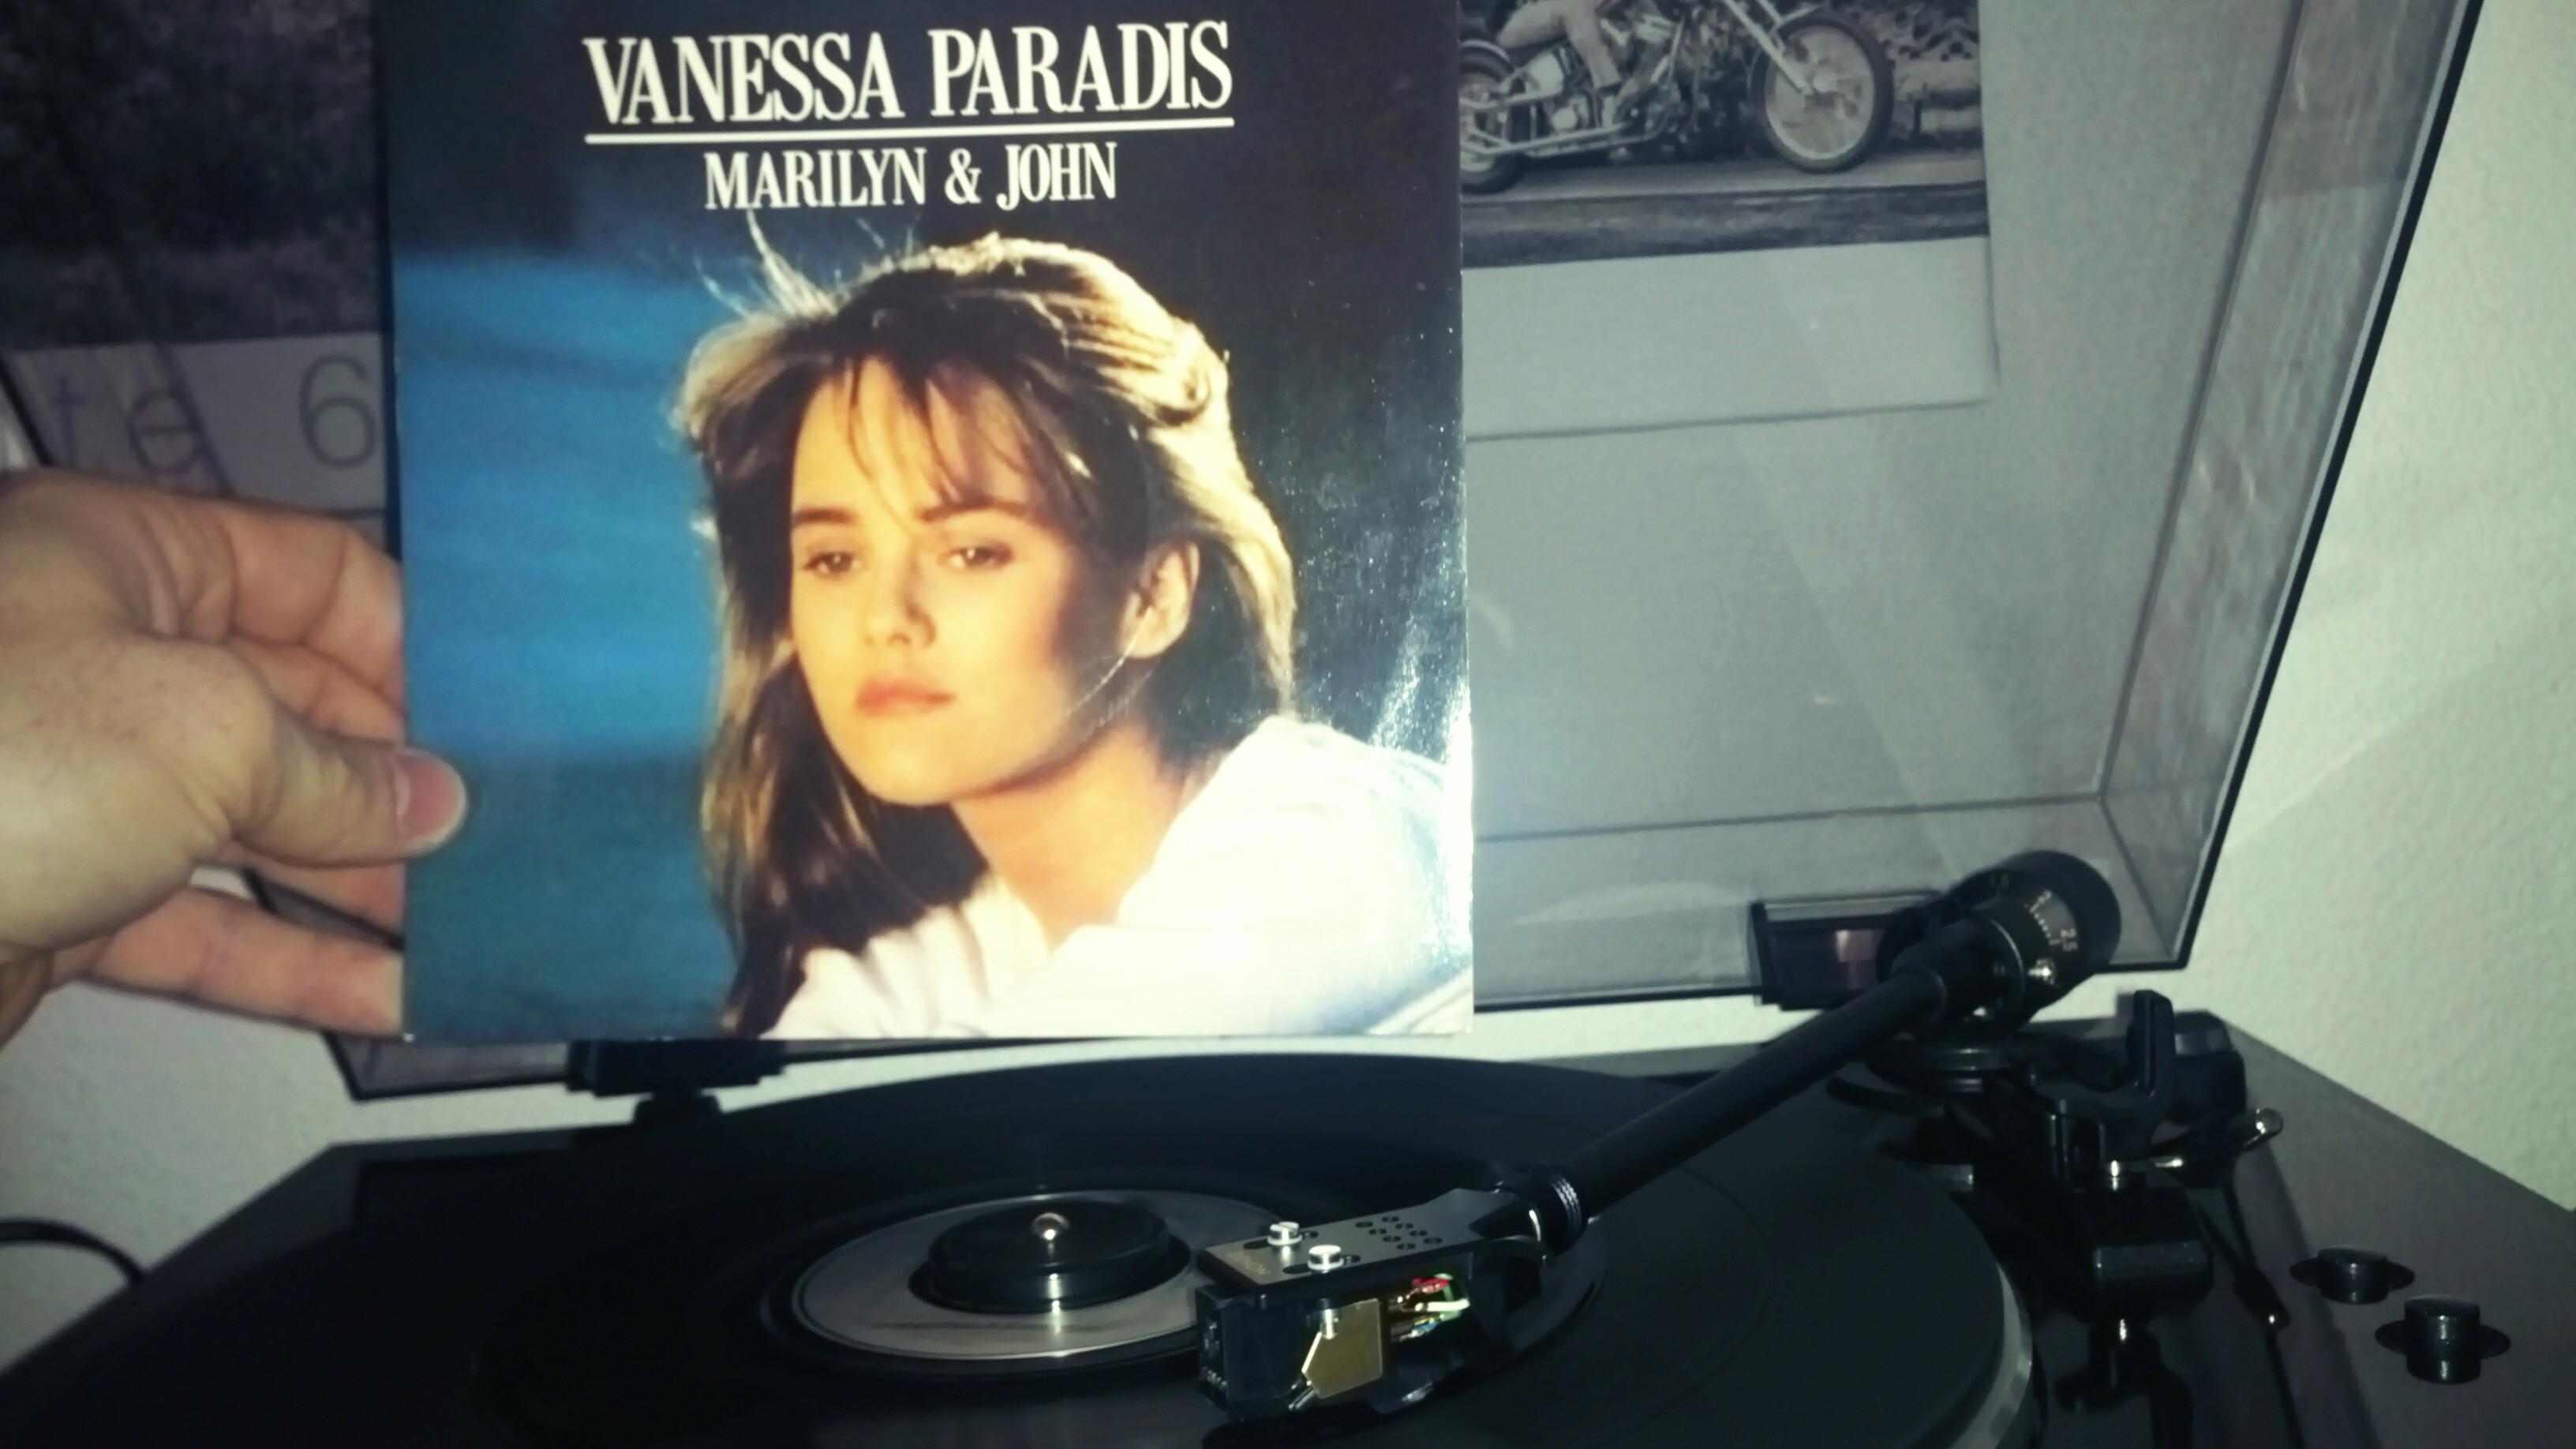 Vanessa Paradis Marilyn et John – Vinyle 45 tours SP 1988